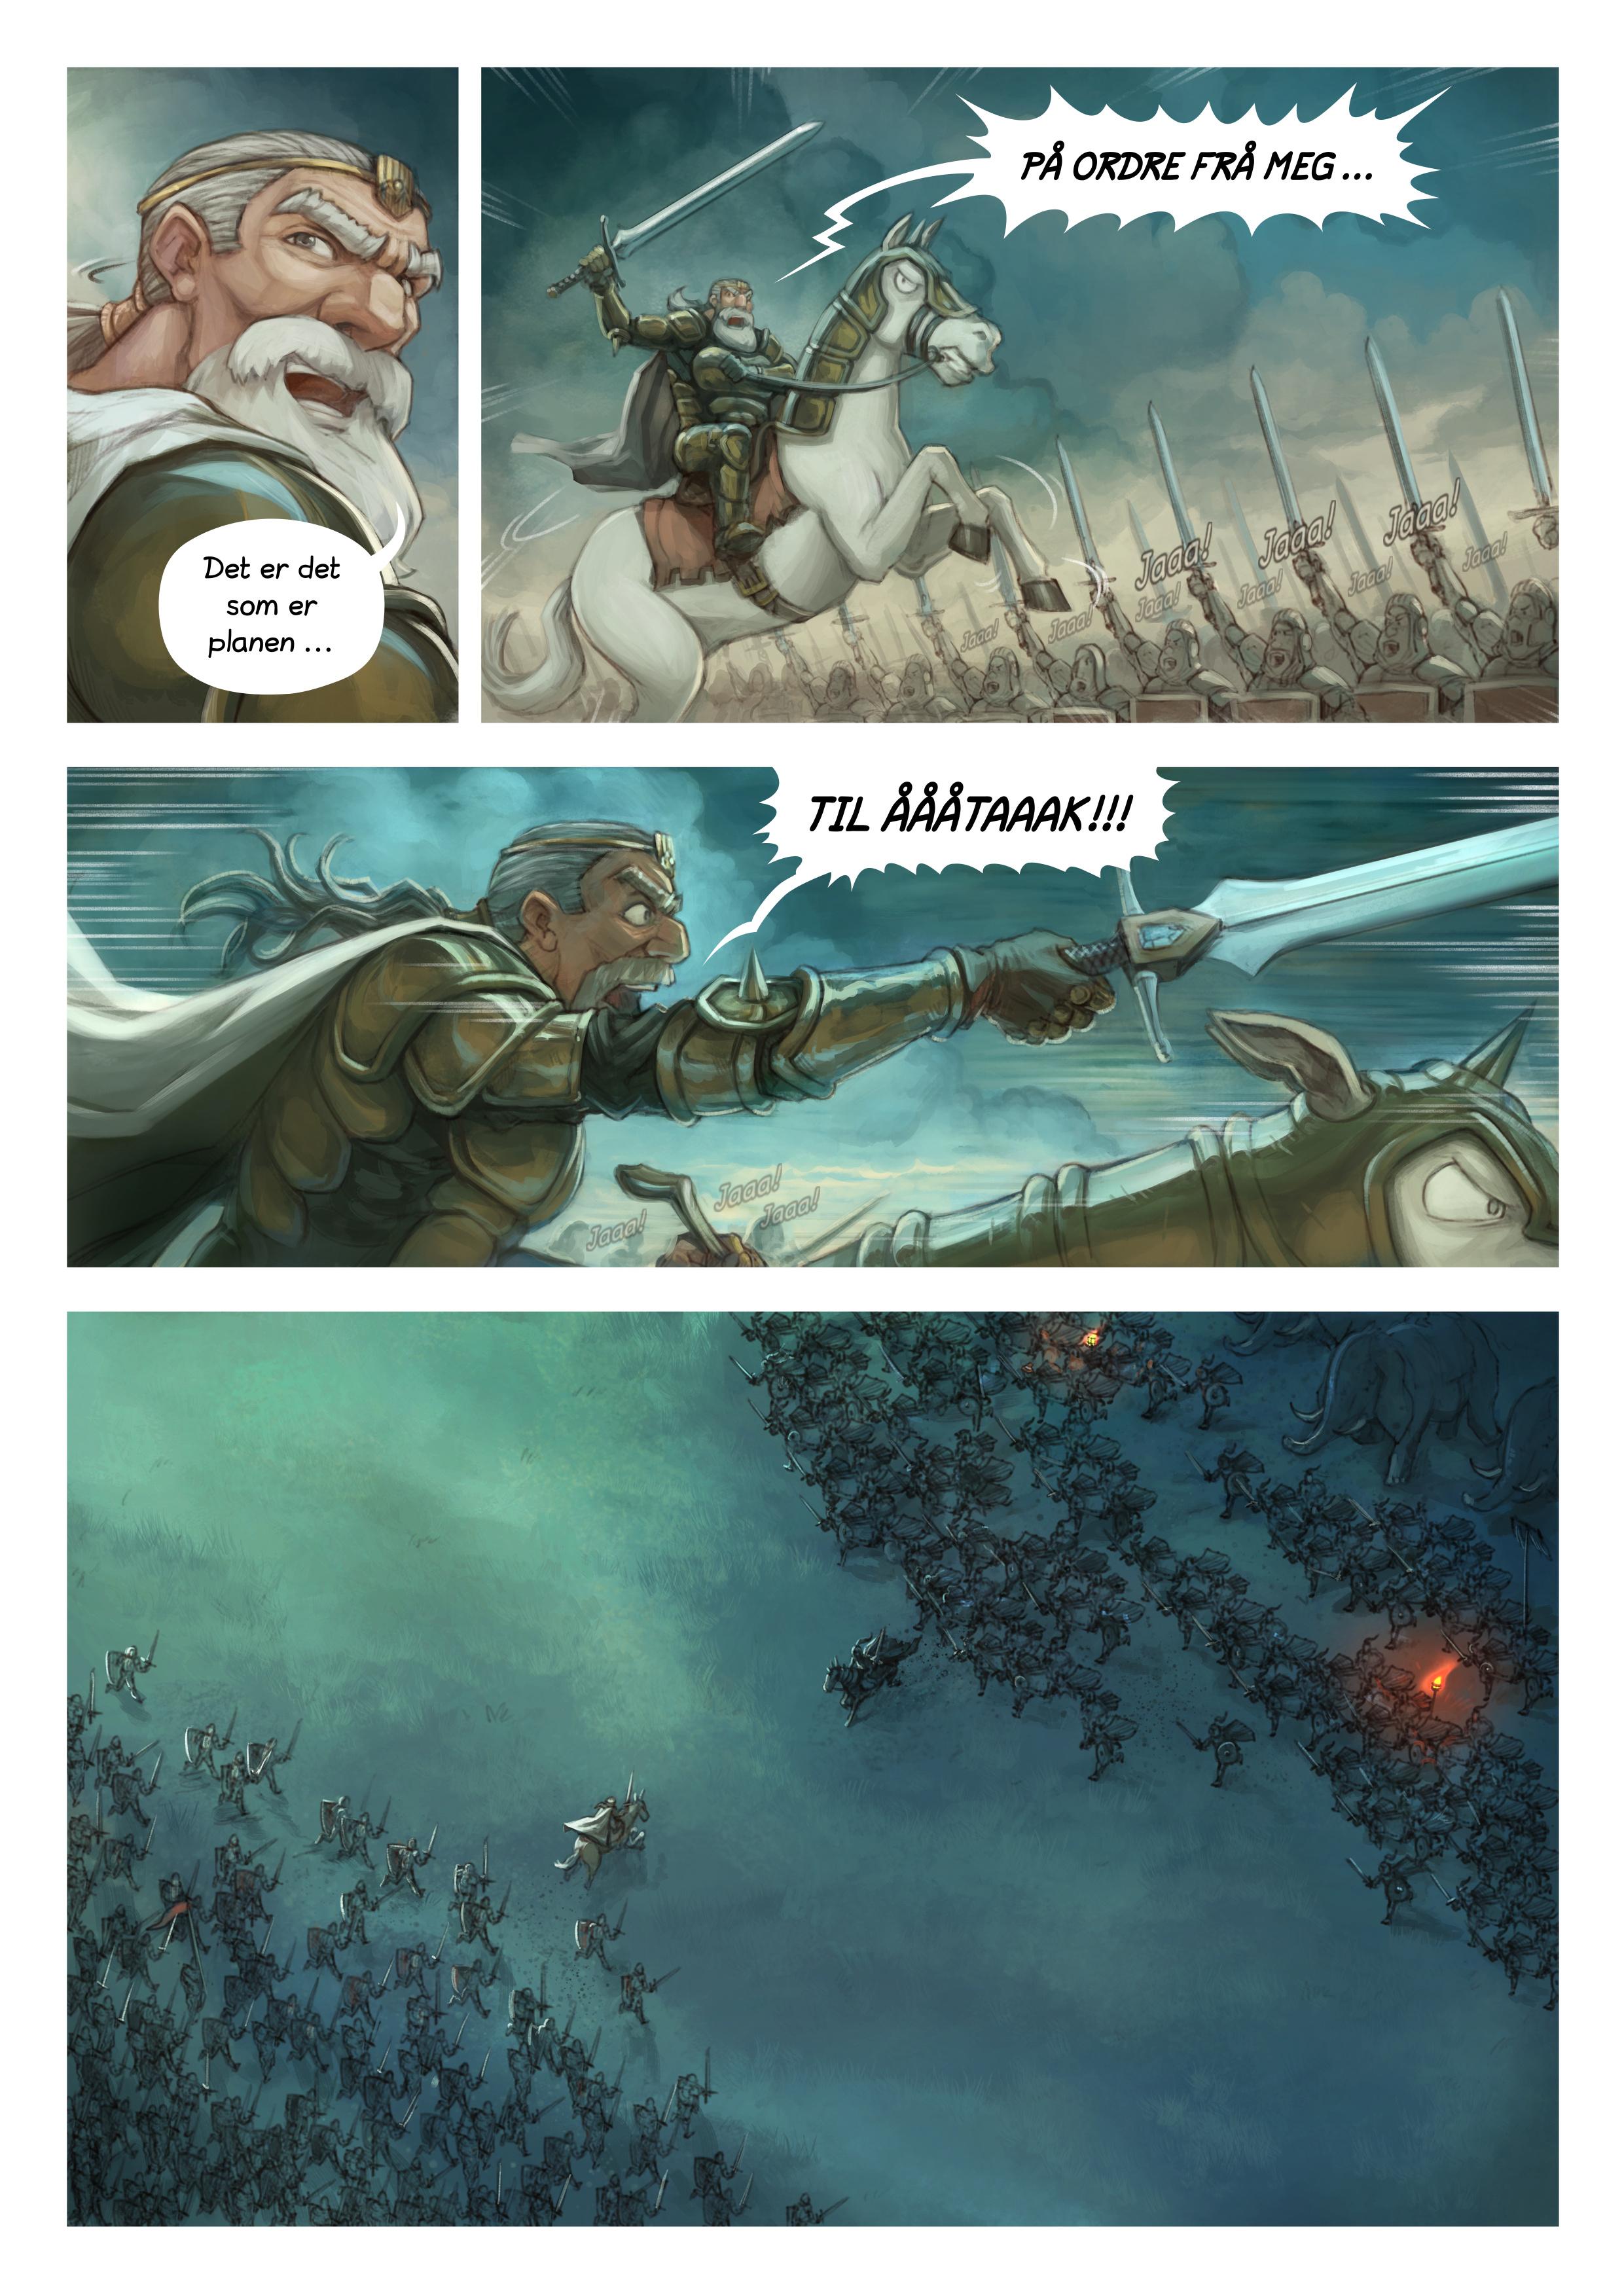 Episode 33: Krigsmagi, Side 4